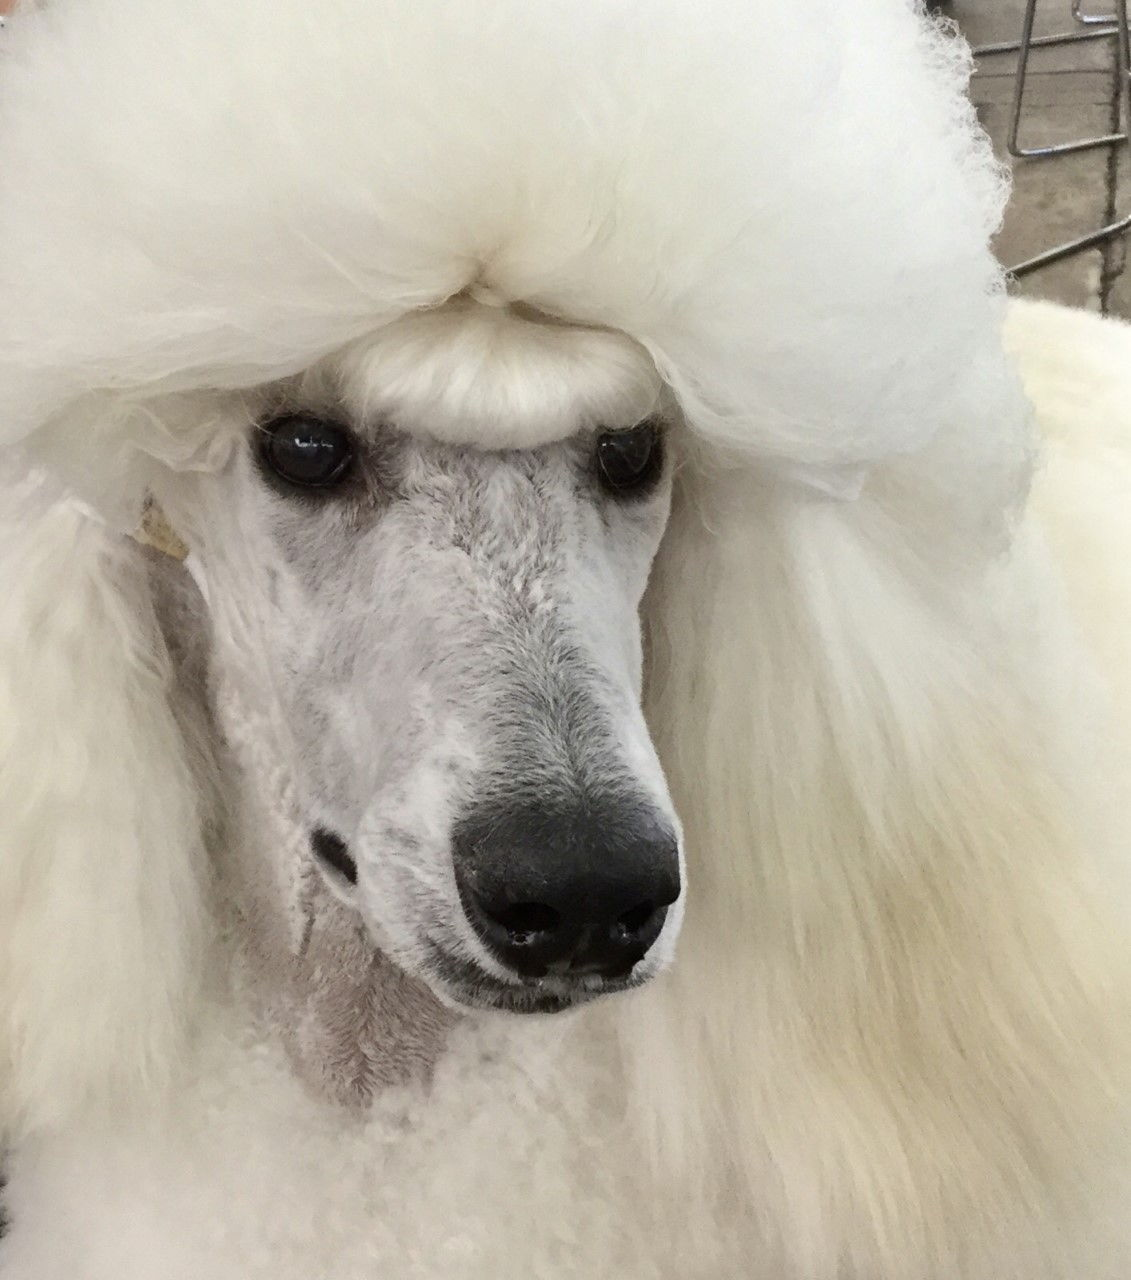 Jennifer's Dog, Dylan